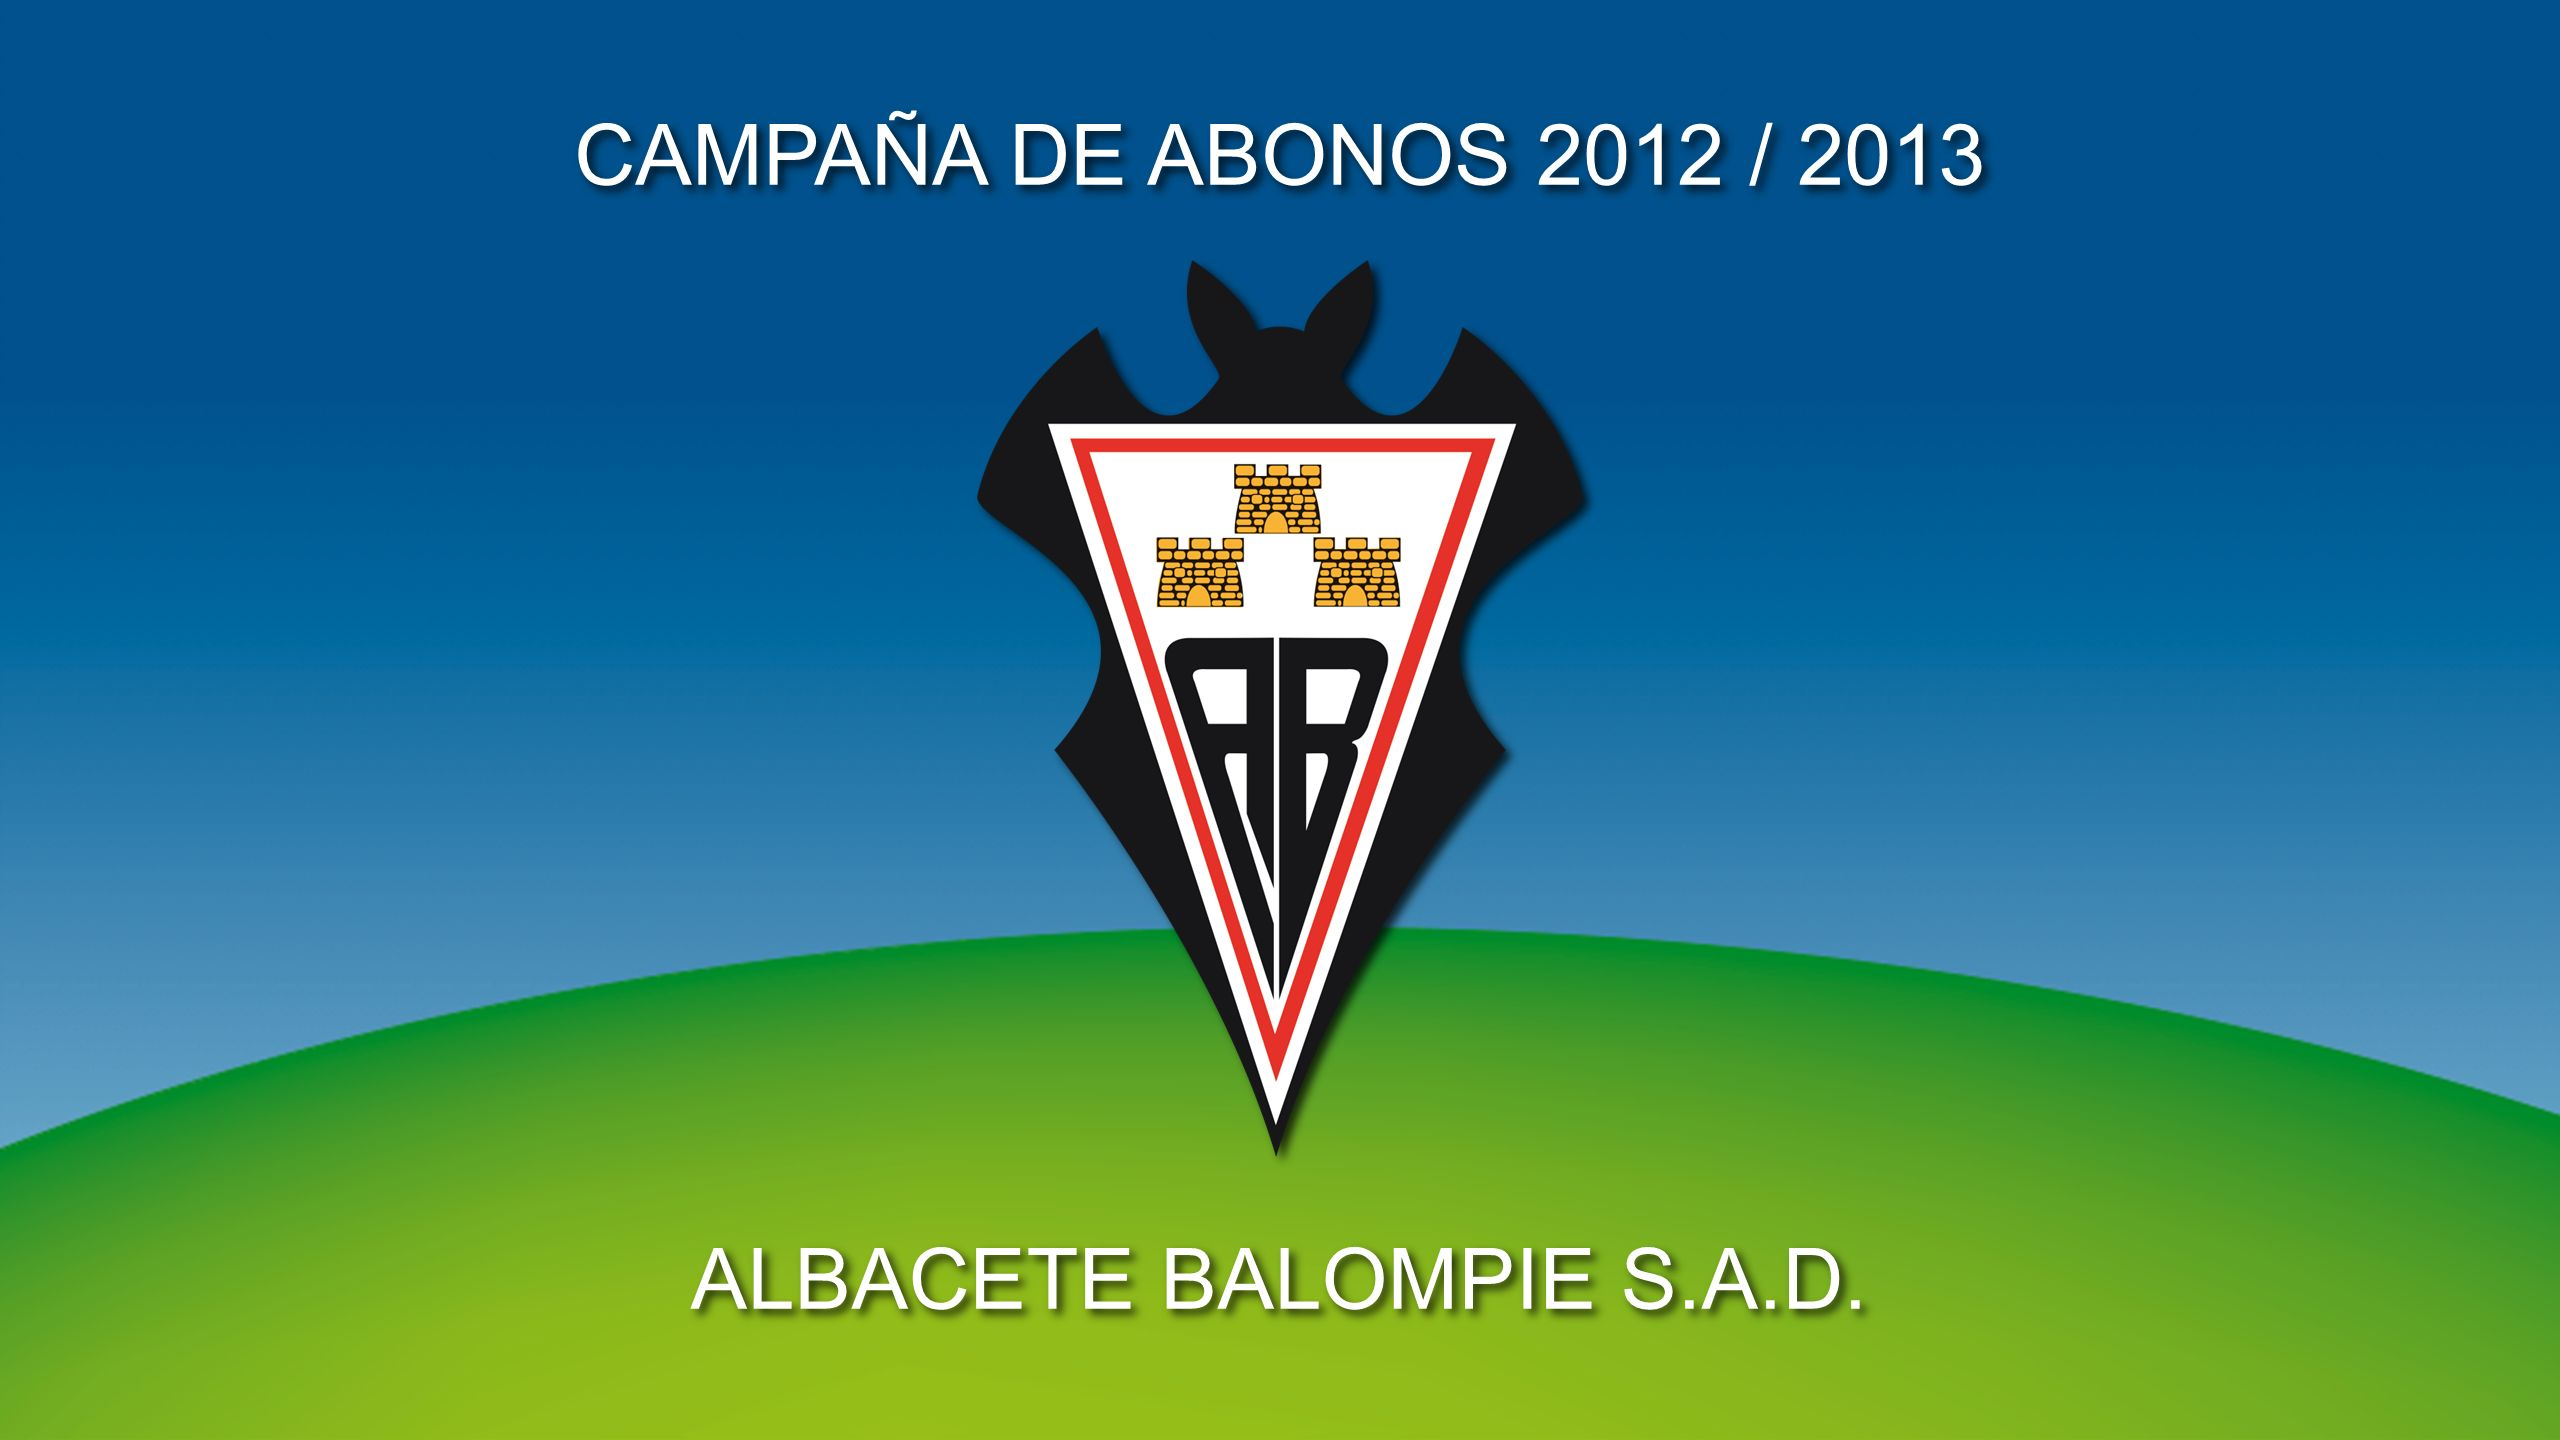 ALBACETE BALOMPIE S.A.D. CAMPAÑA DE ABONOS 2012 / 2013